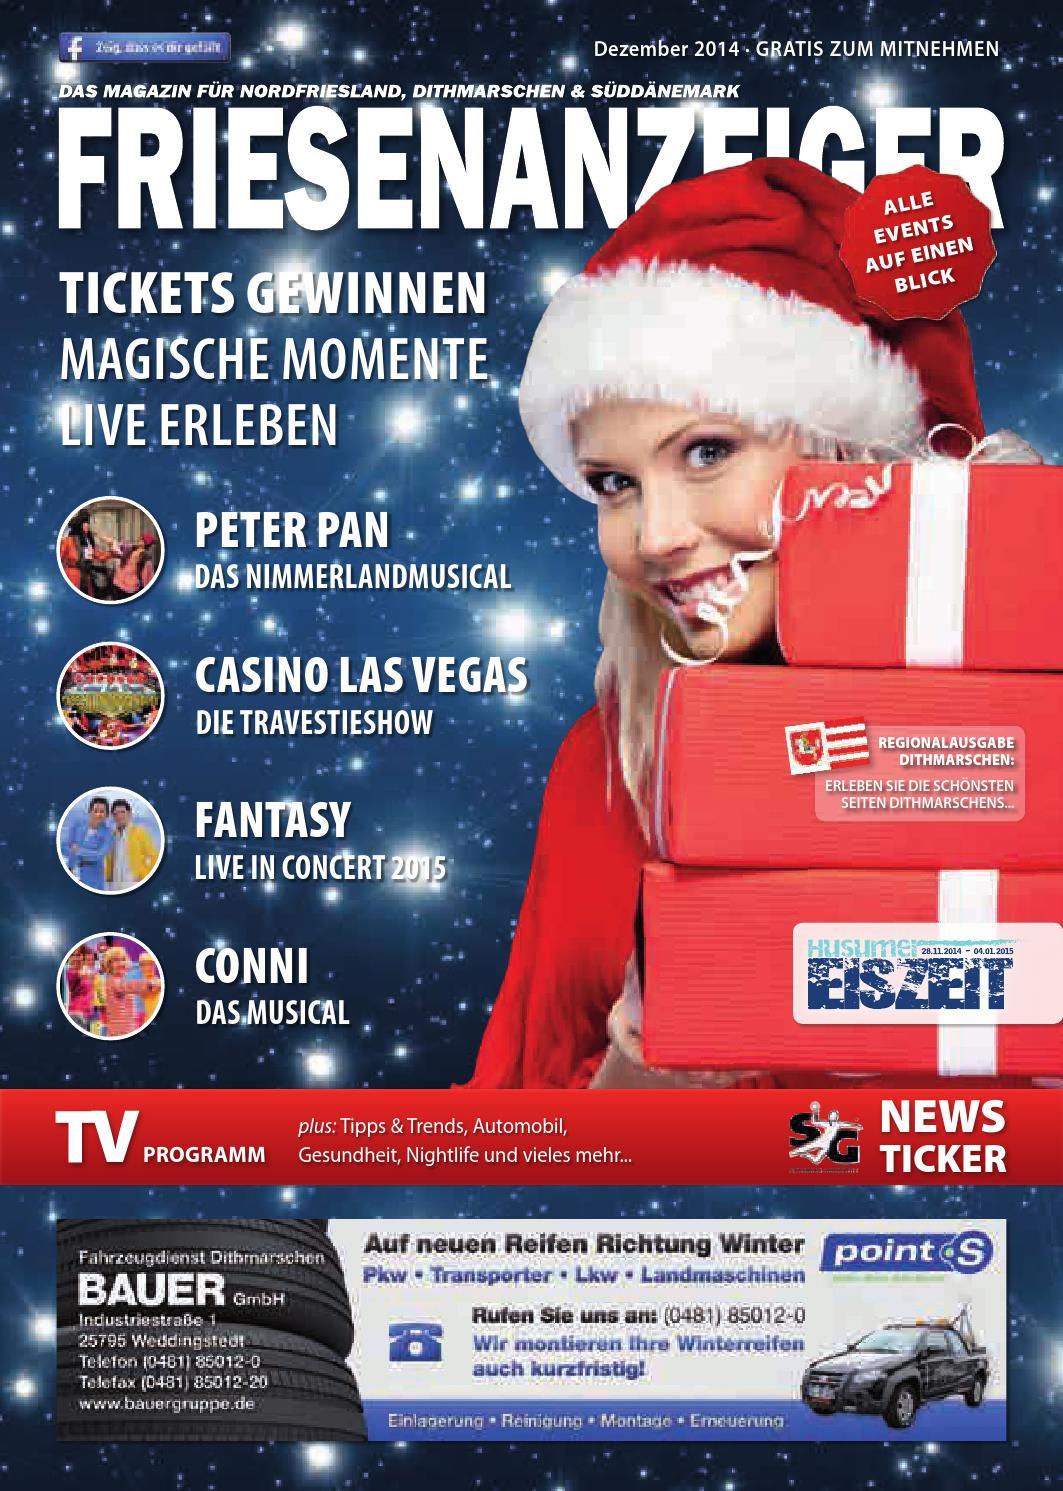 Friesenanzeiger Dezember 2014 by new media works - issuu